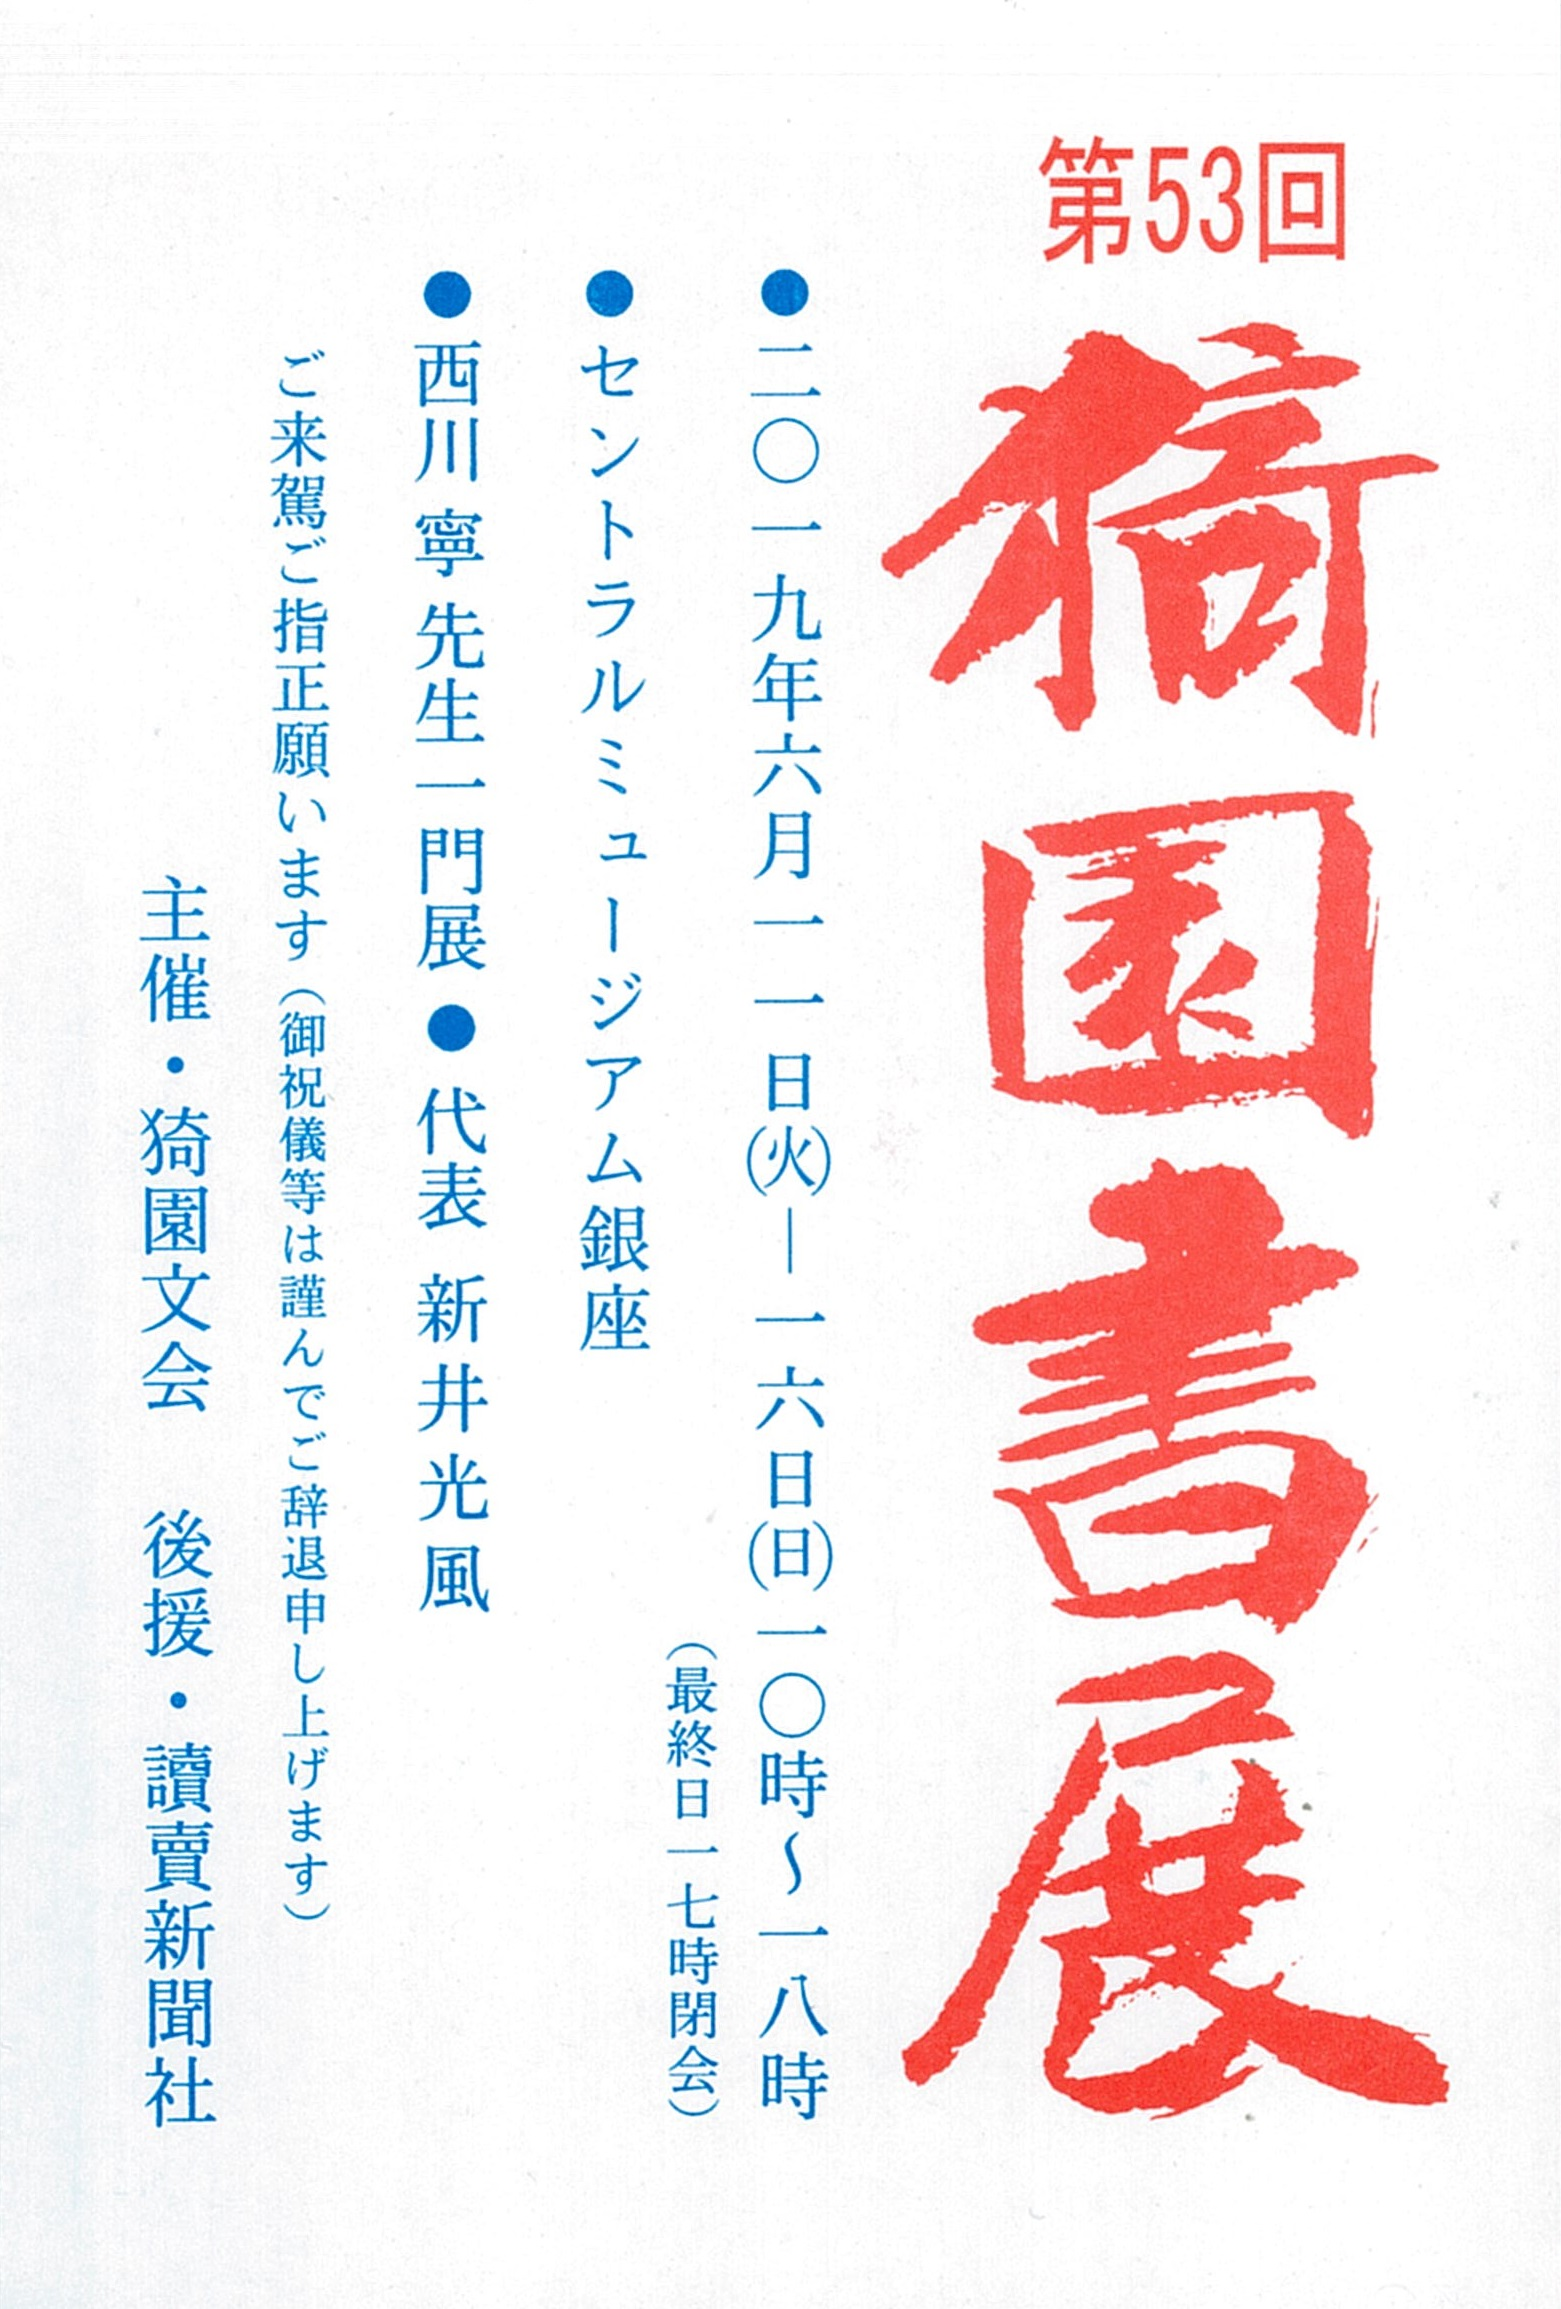 https://garyukai.jp/wp/wp-content/uploads/2019/04/20190405154415-0002.jpg